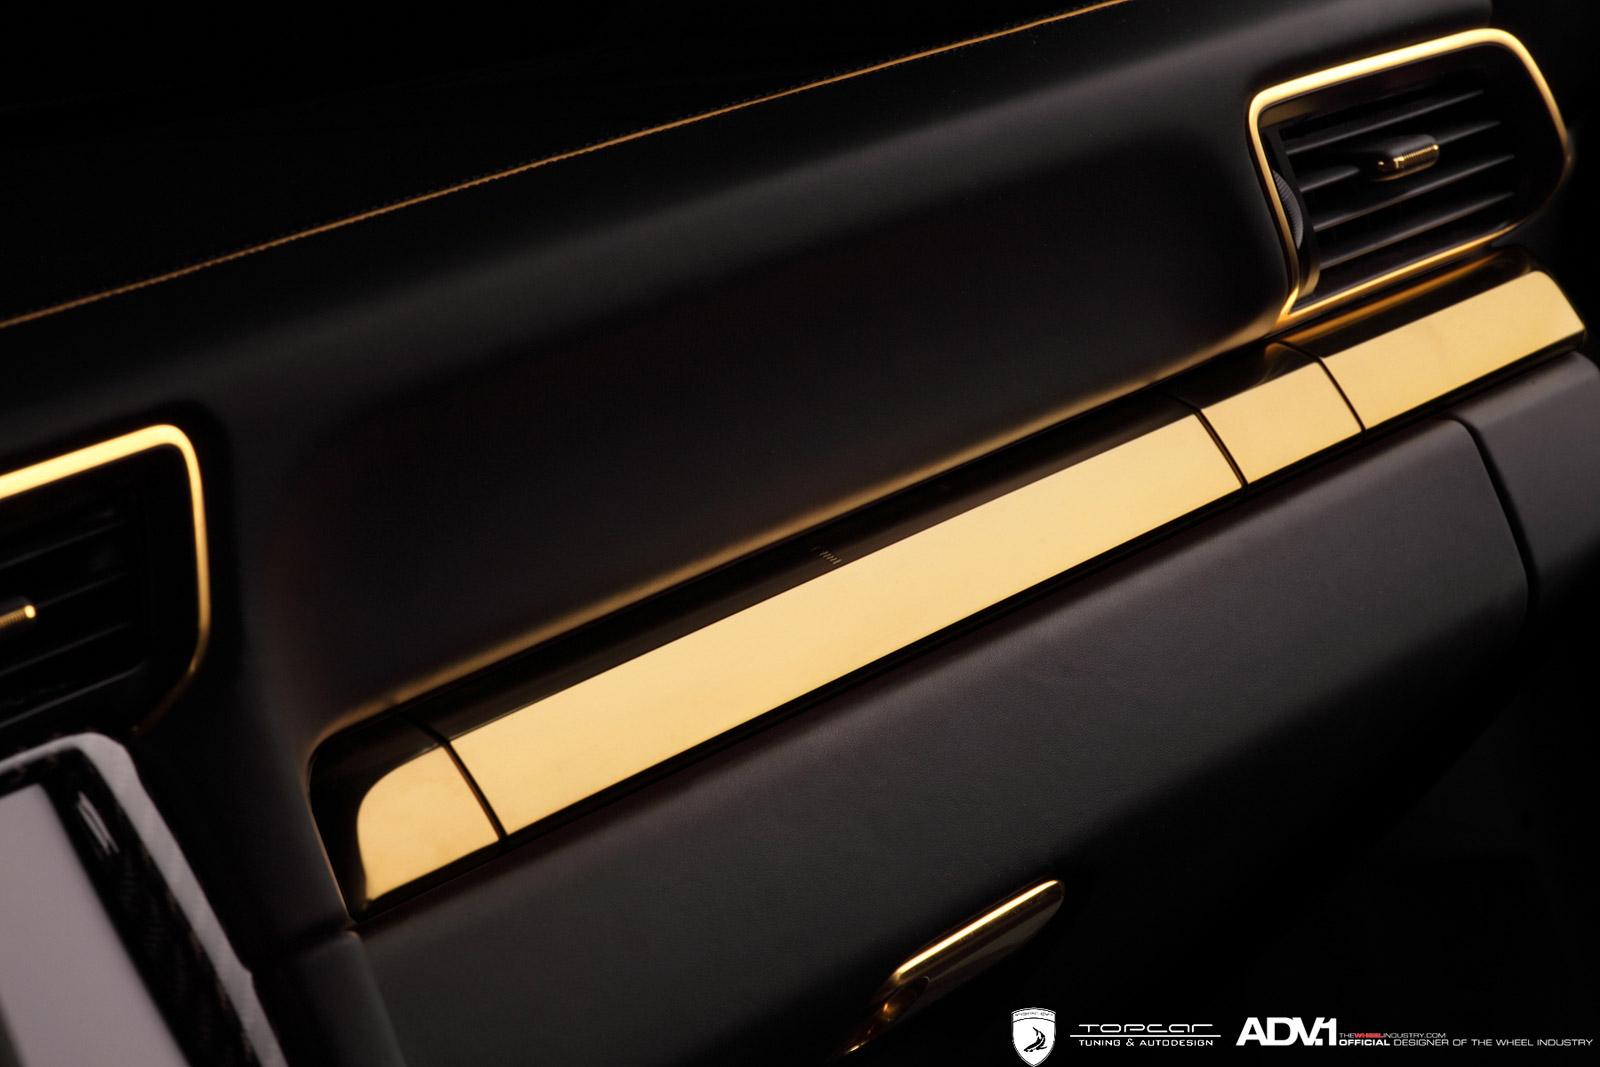 porsche-911-turbo-typ-991-topcar-stinger-gtr-034